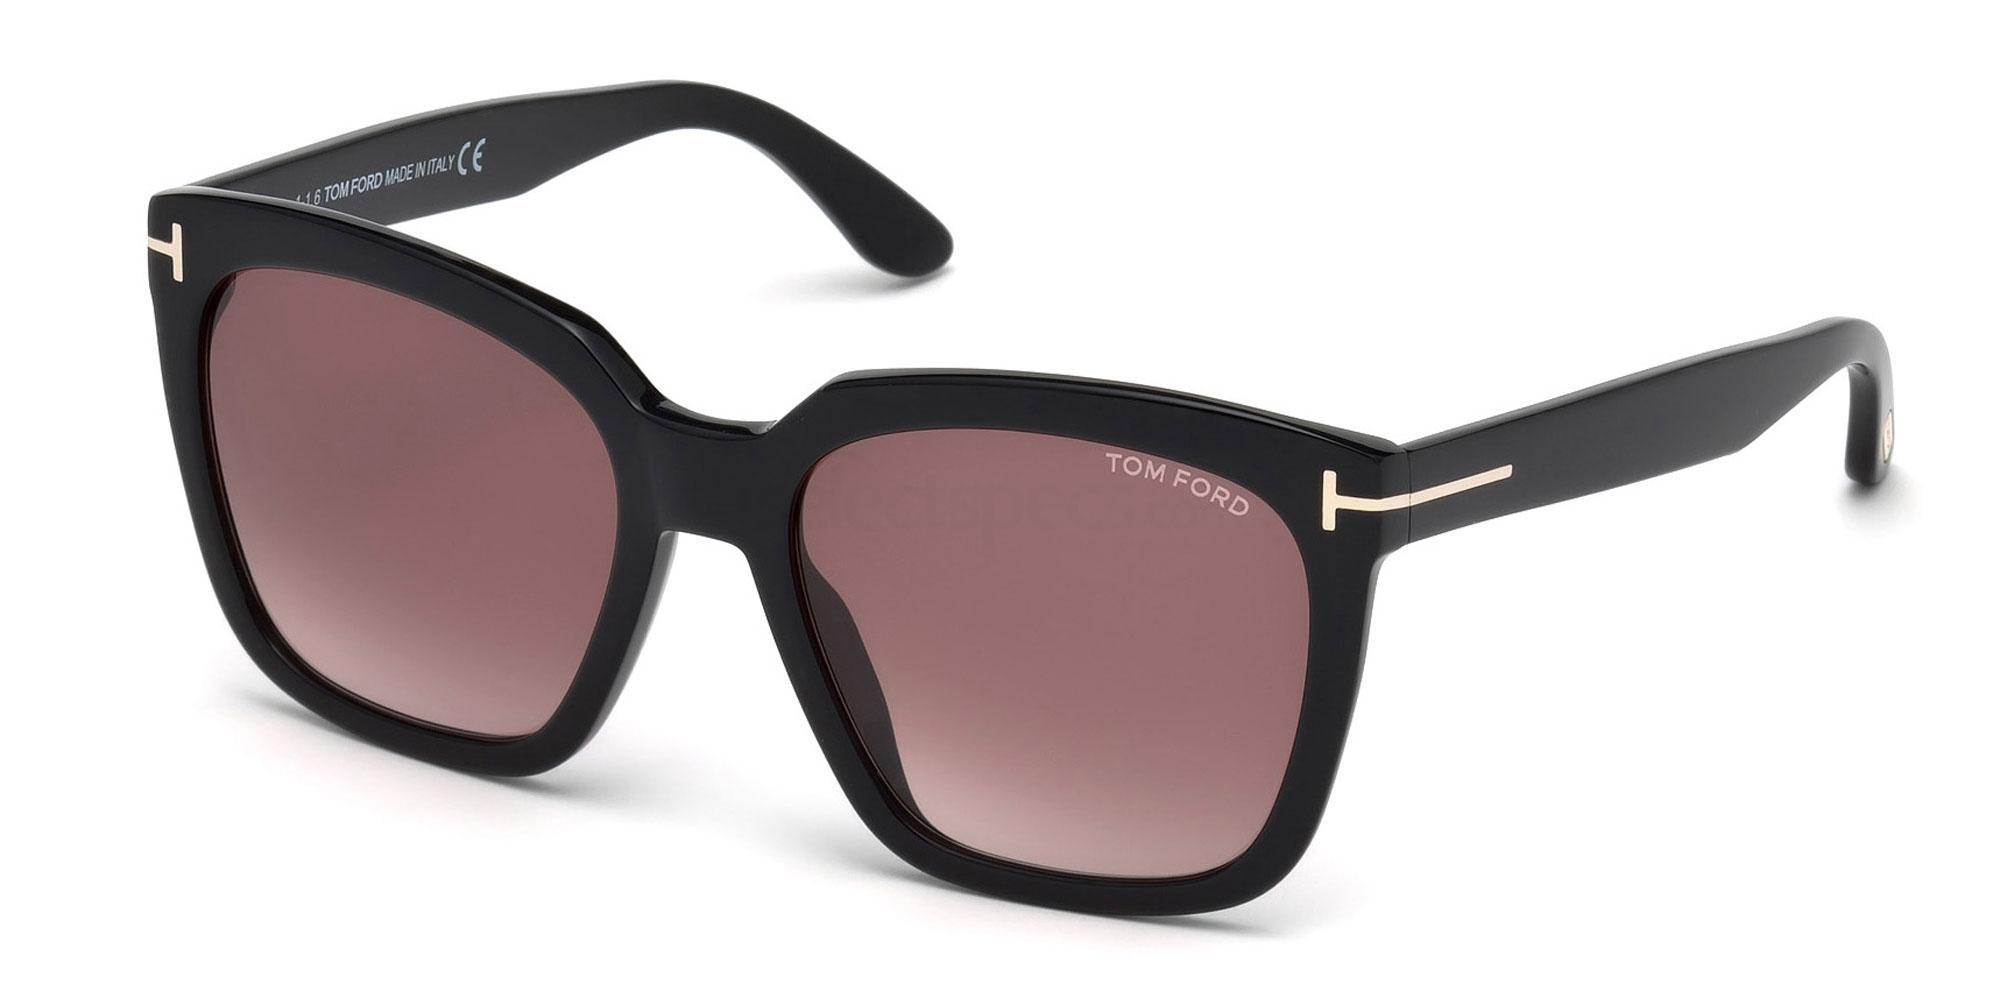 01T FT0502 Sunglasses, Tom Ford